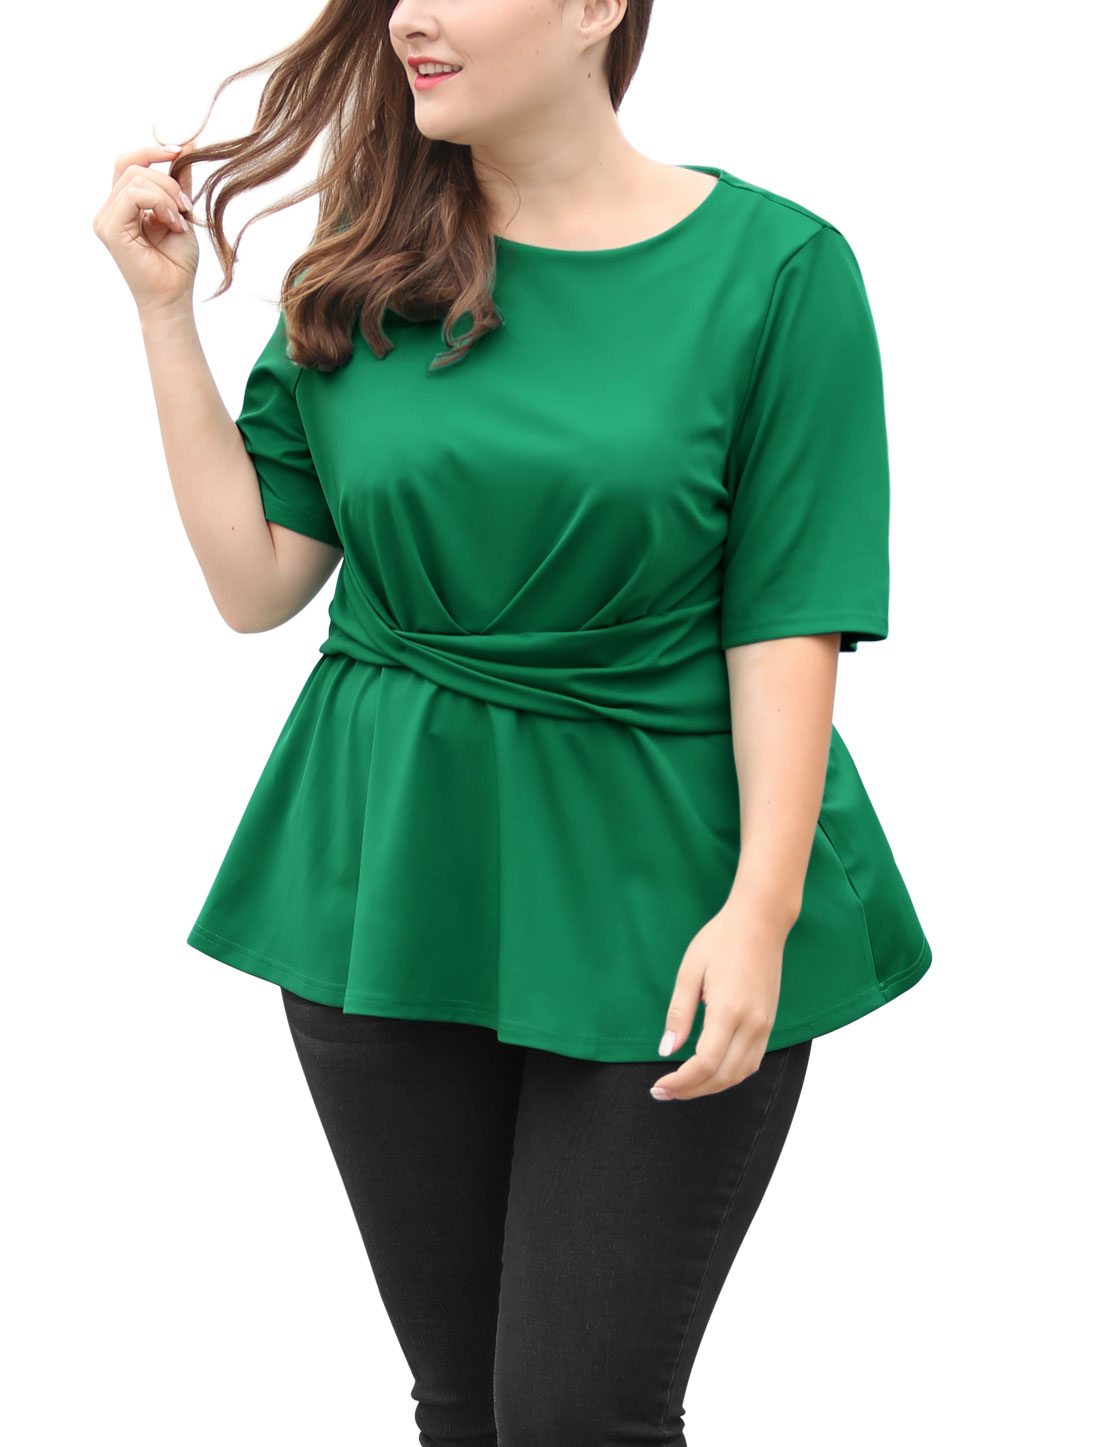 Unique Bargains Women's Plus Size Twisted Knot Front Short Sleeves Peplum Top